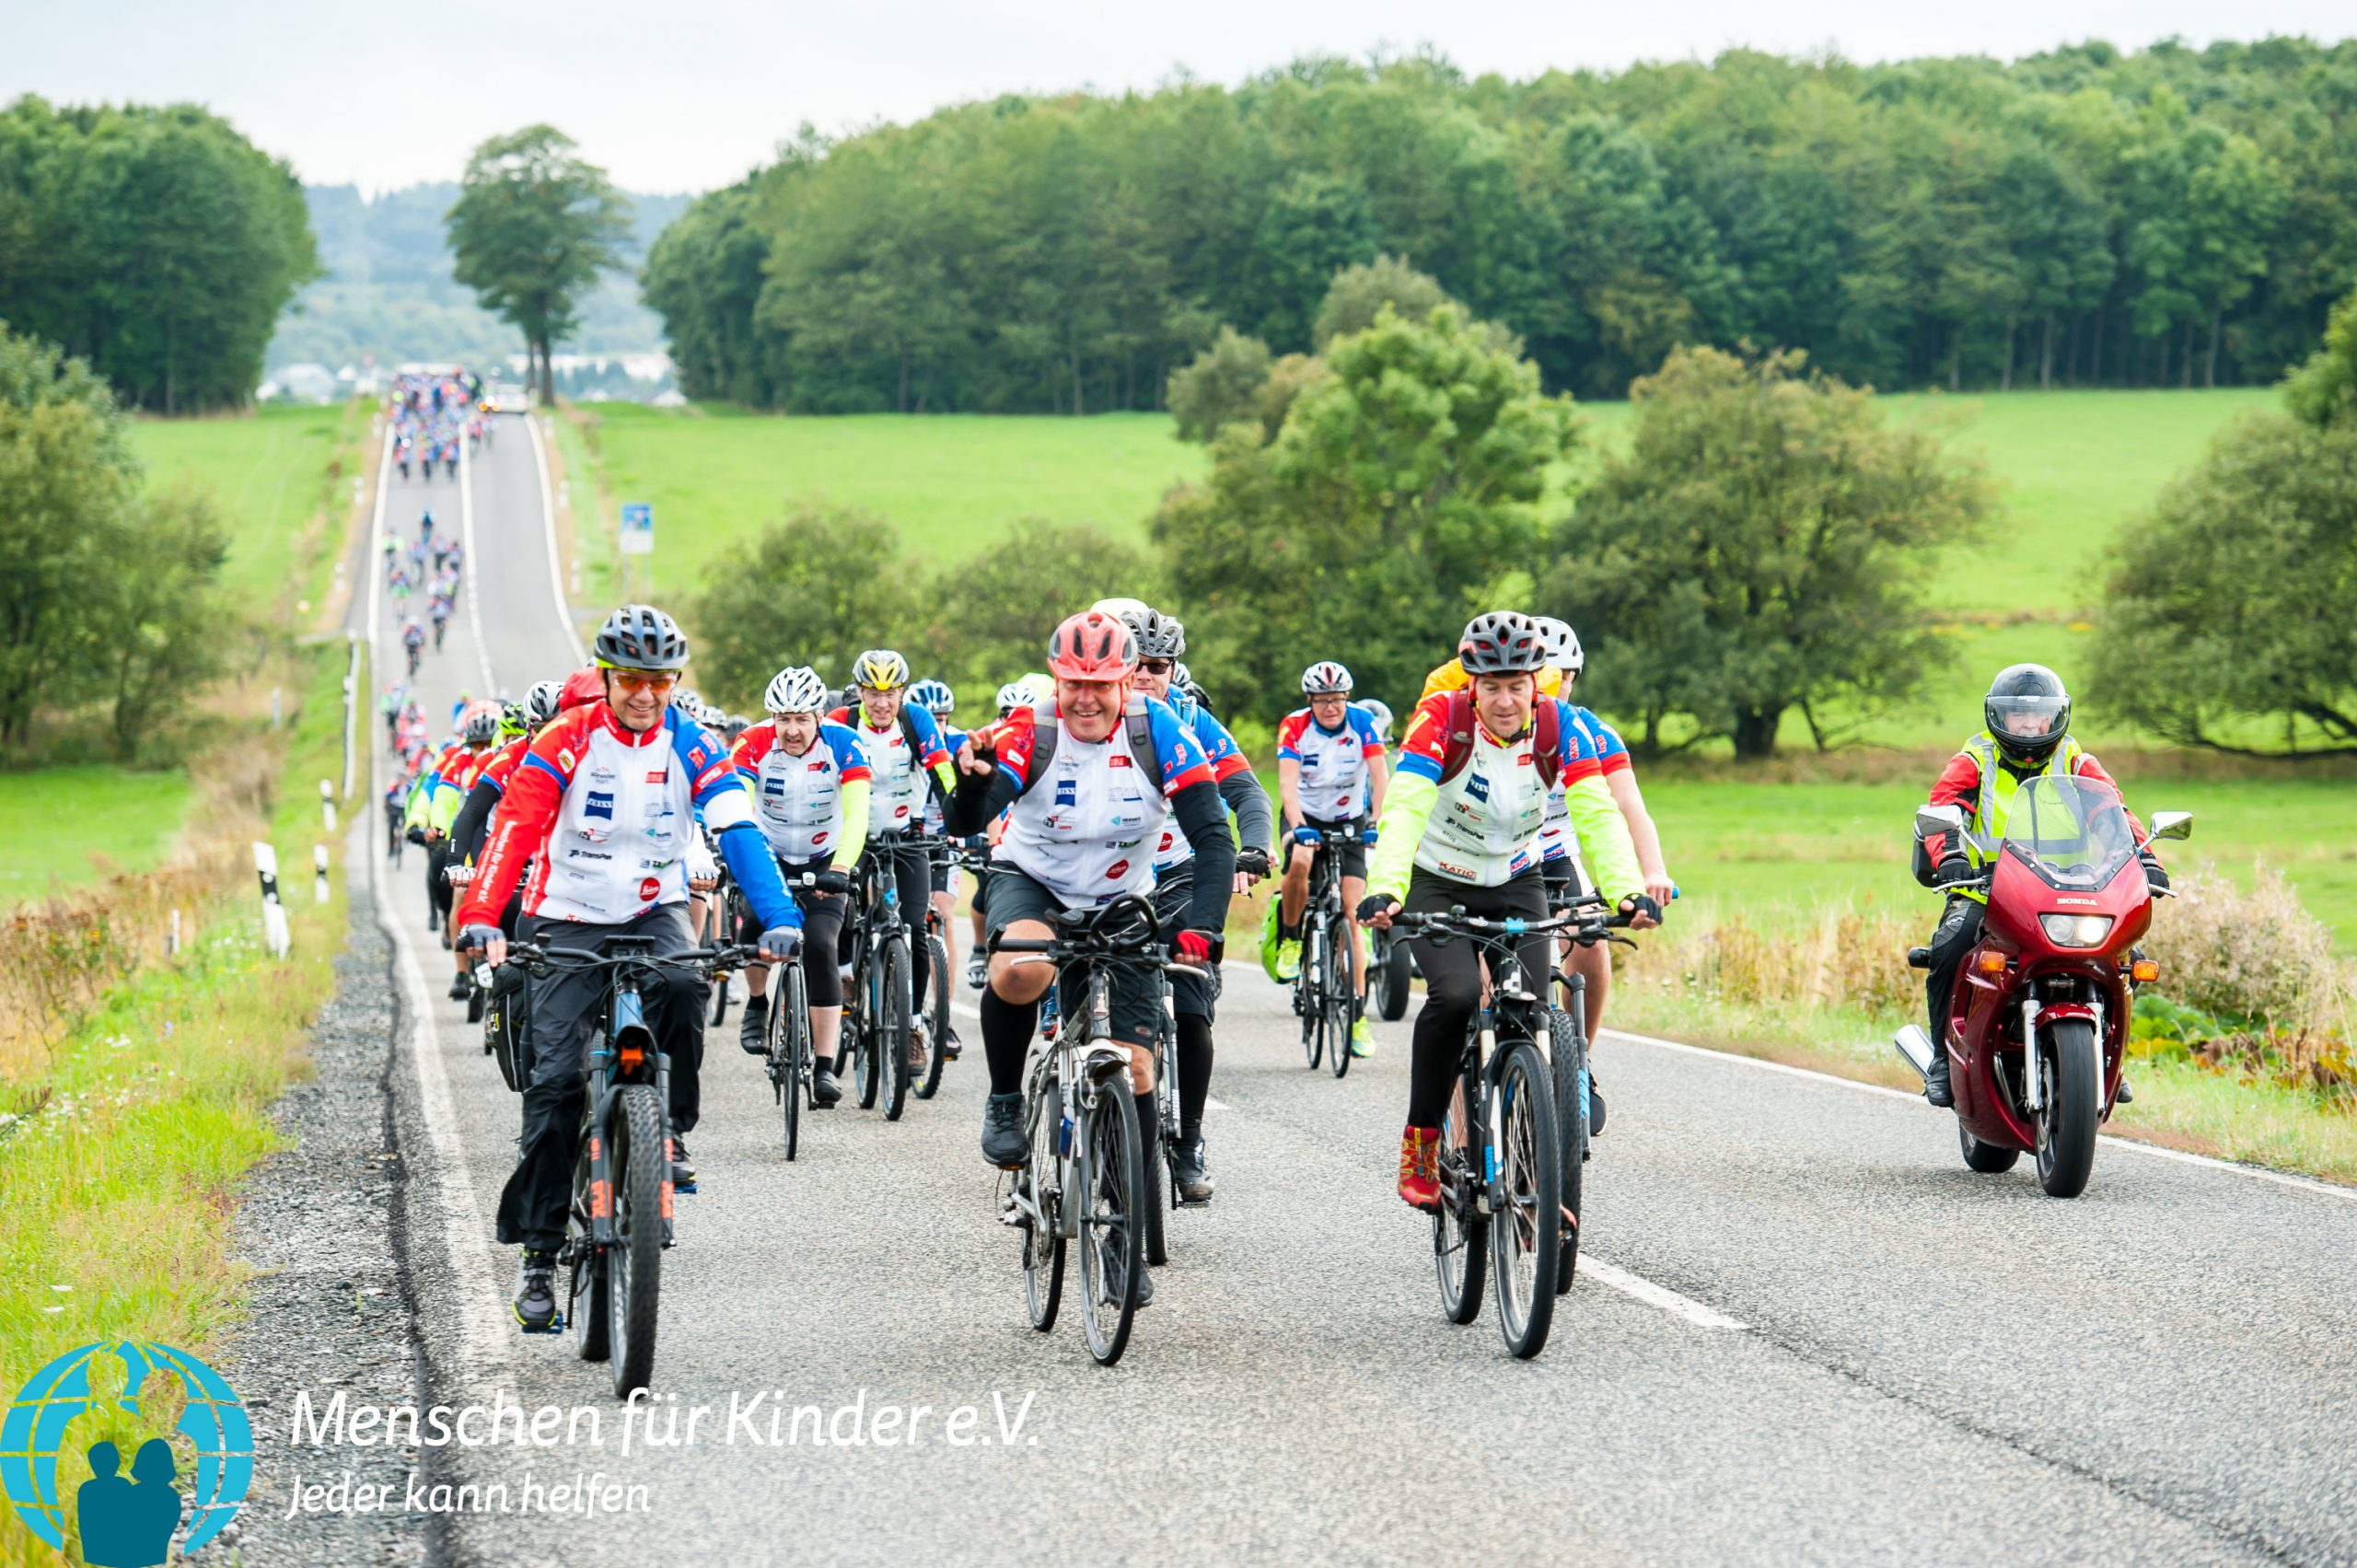 MfK Benefiz Radtour 2022 - Save the date